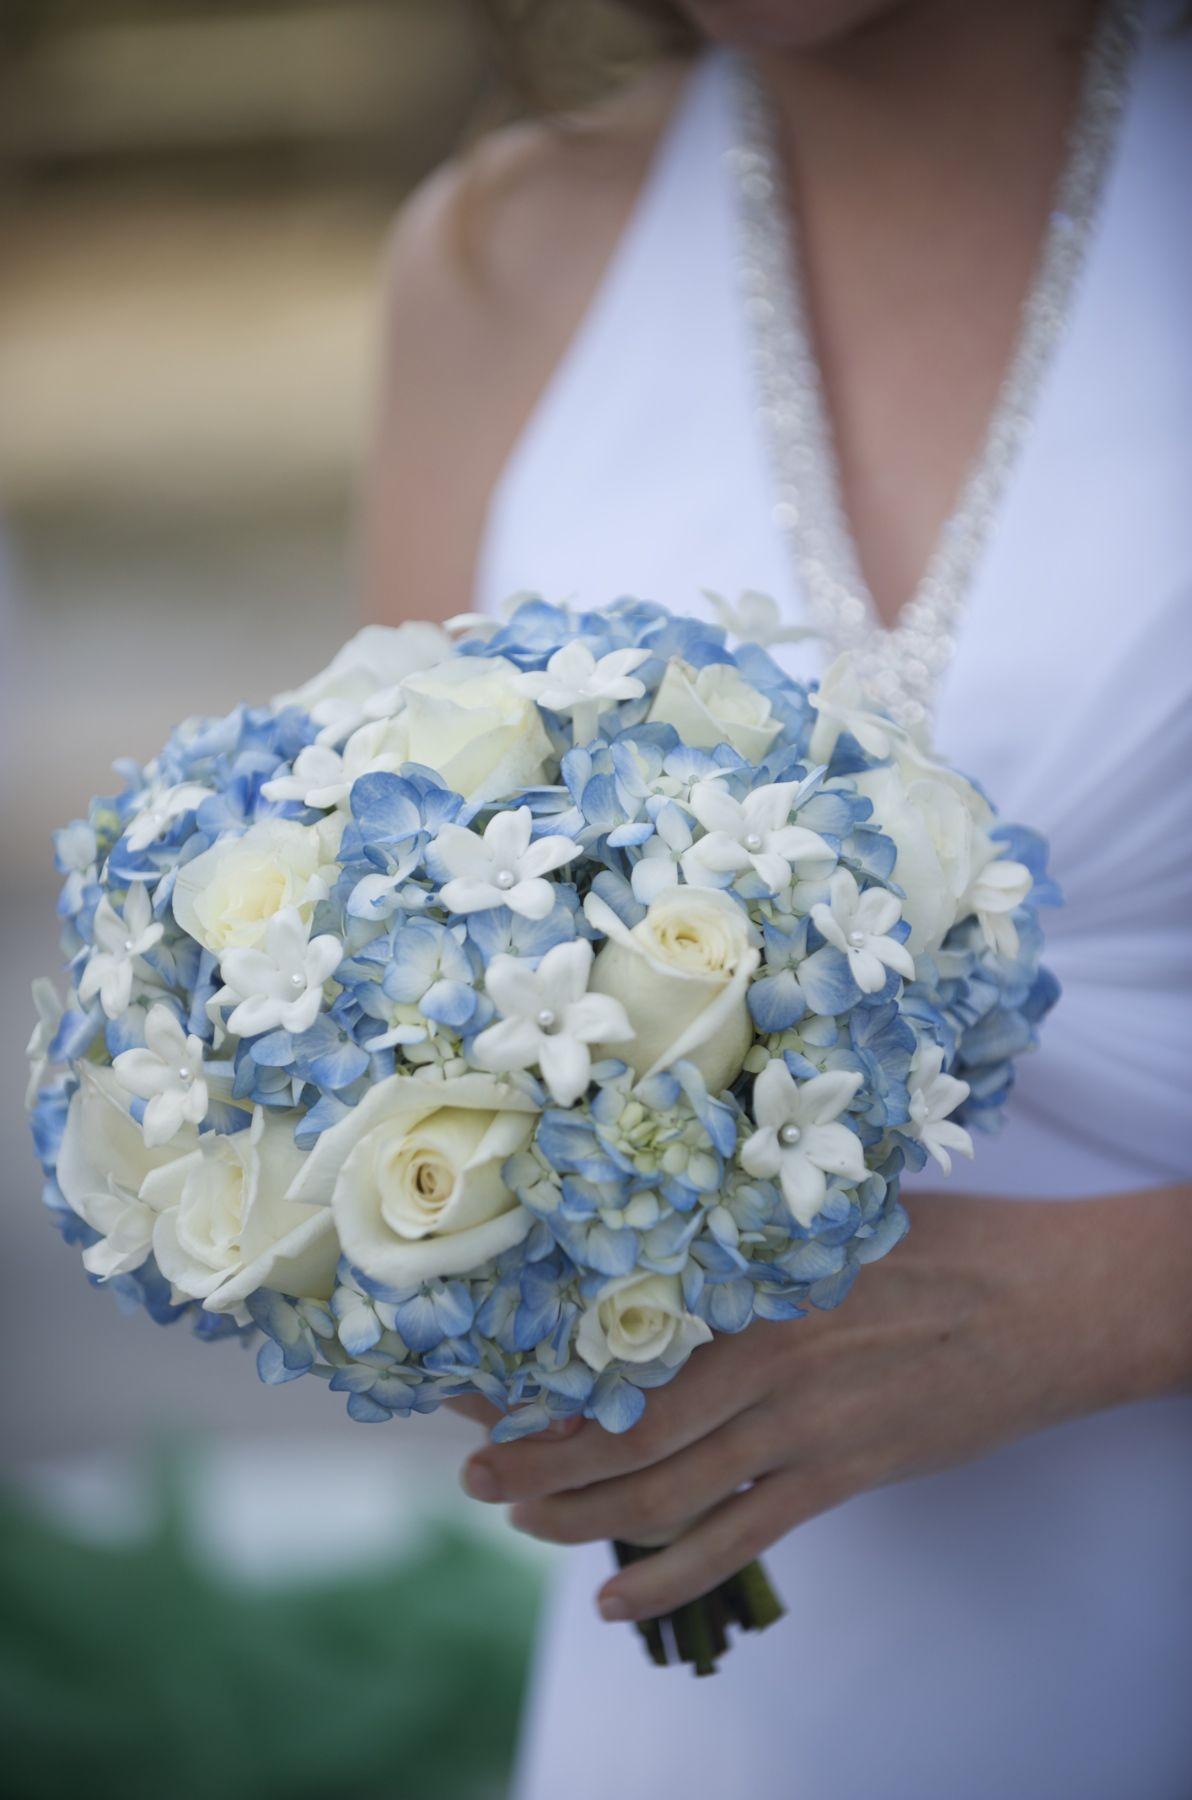 Blue Hydrangeas Vendelas Roses Ivory Stephanotis White And Bridal Bouquet Landys